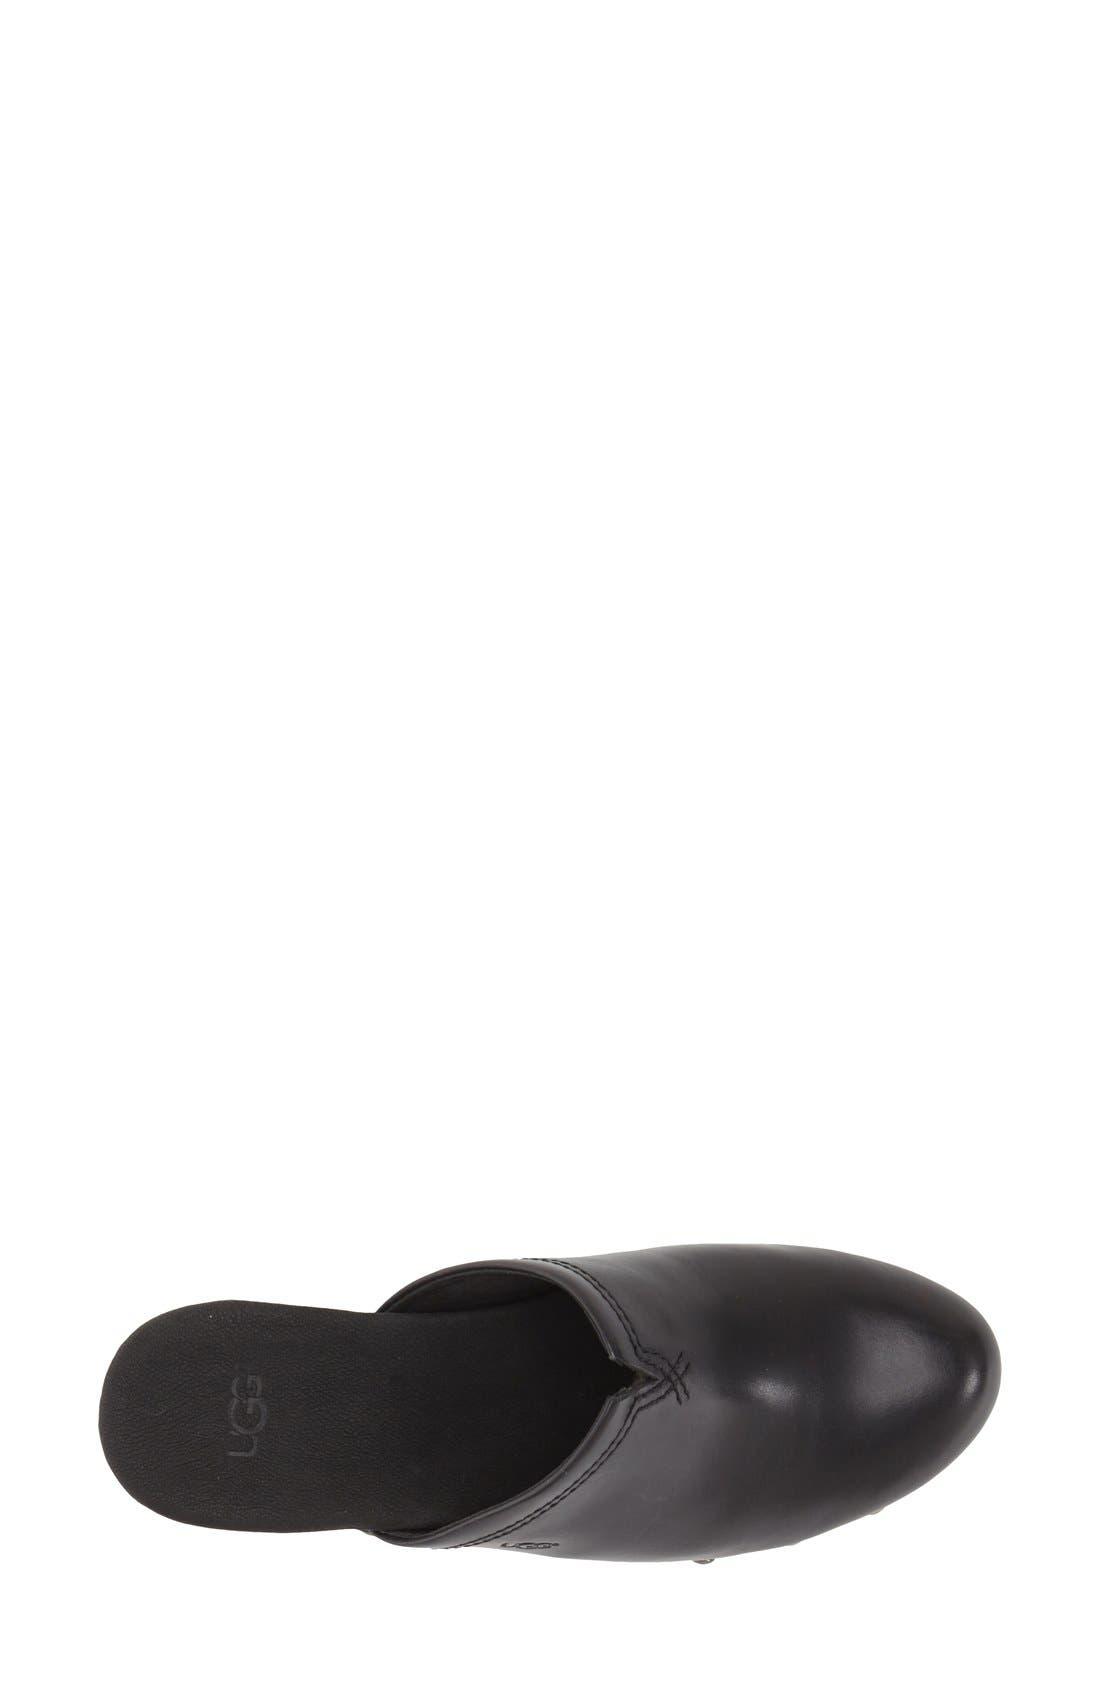 'Kay' Clog,                             Alternate thumbnail 3, color,                             Black Leather